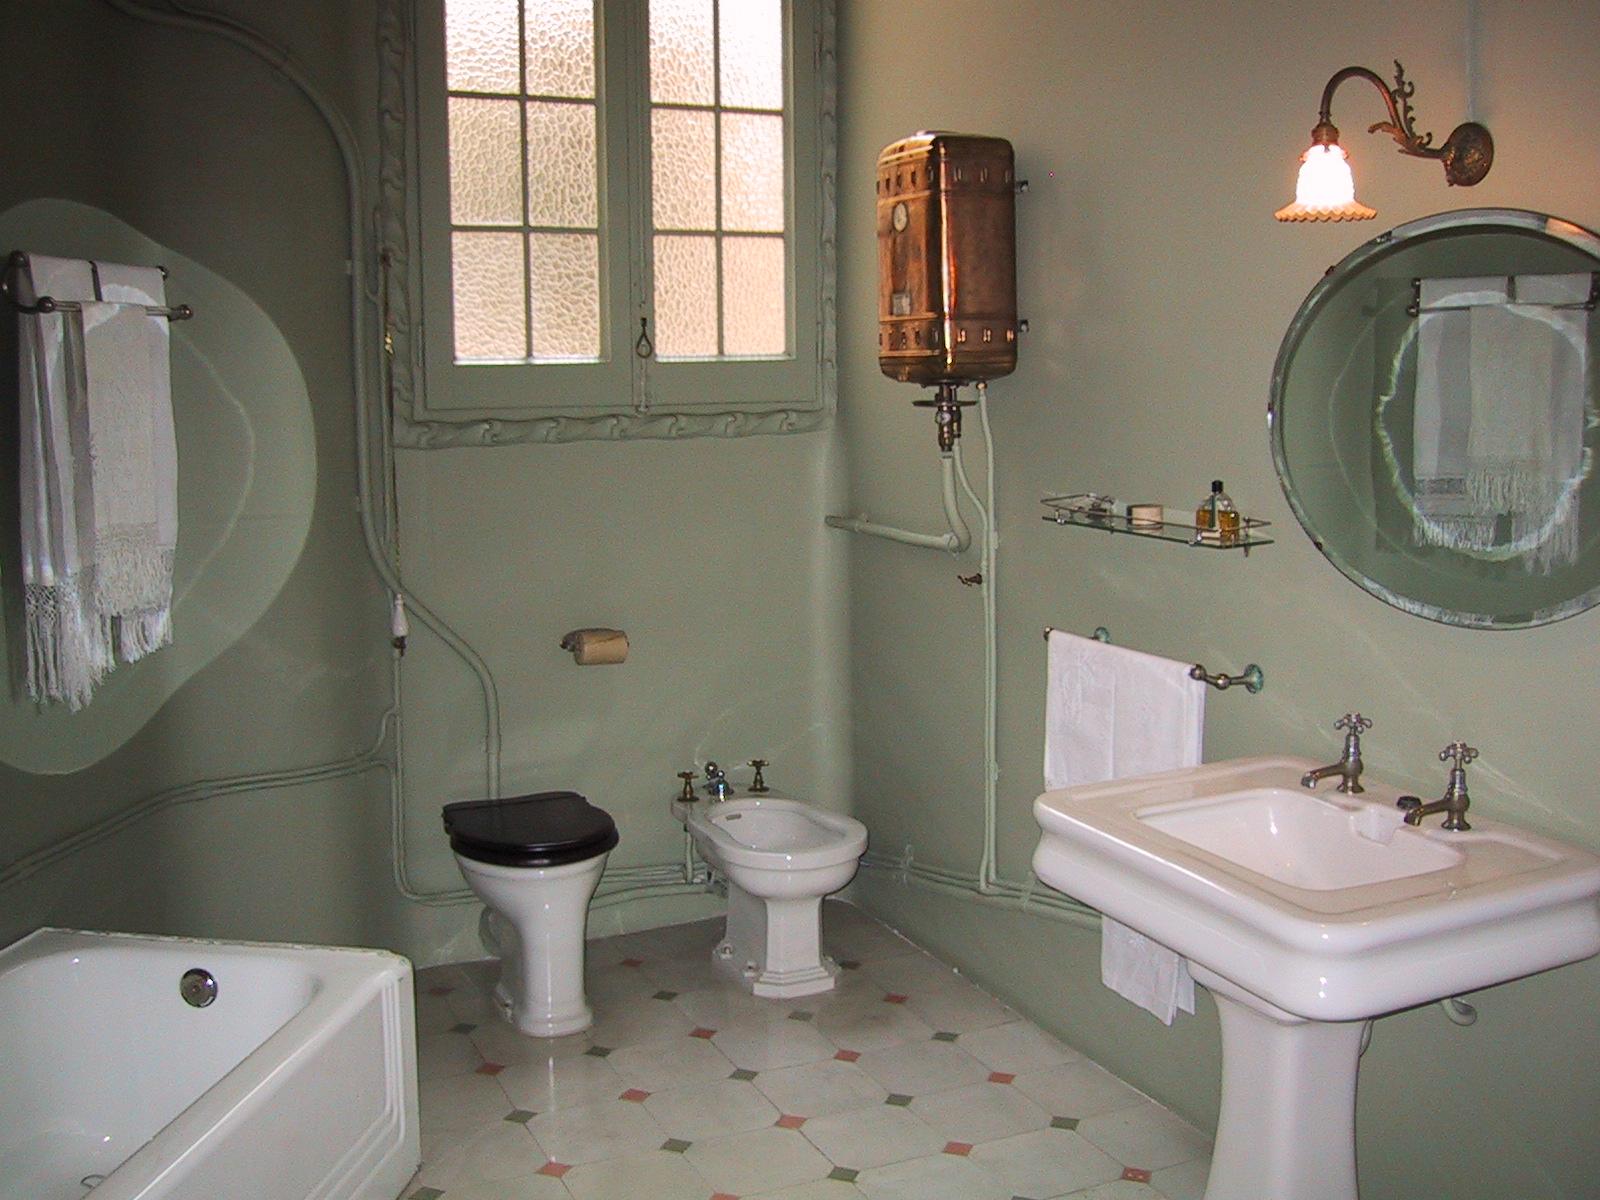 Разорвали стену в туалете 1 фотография